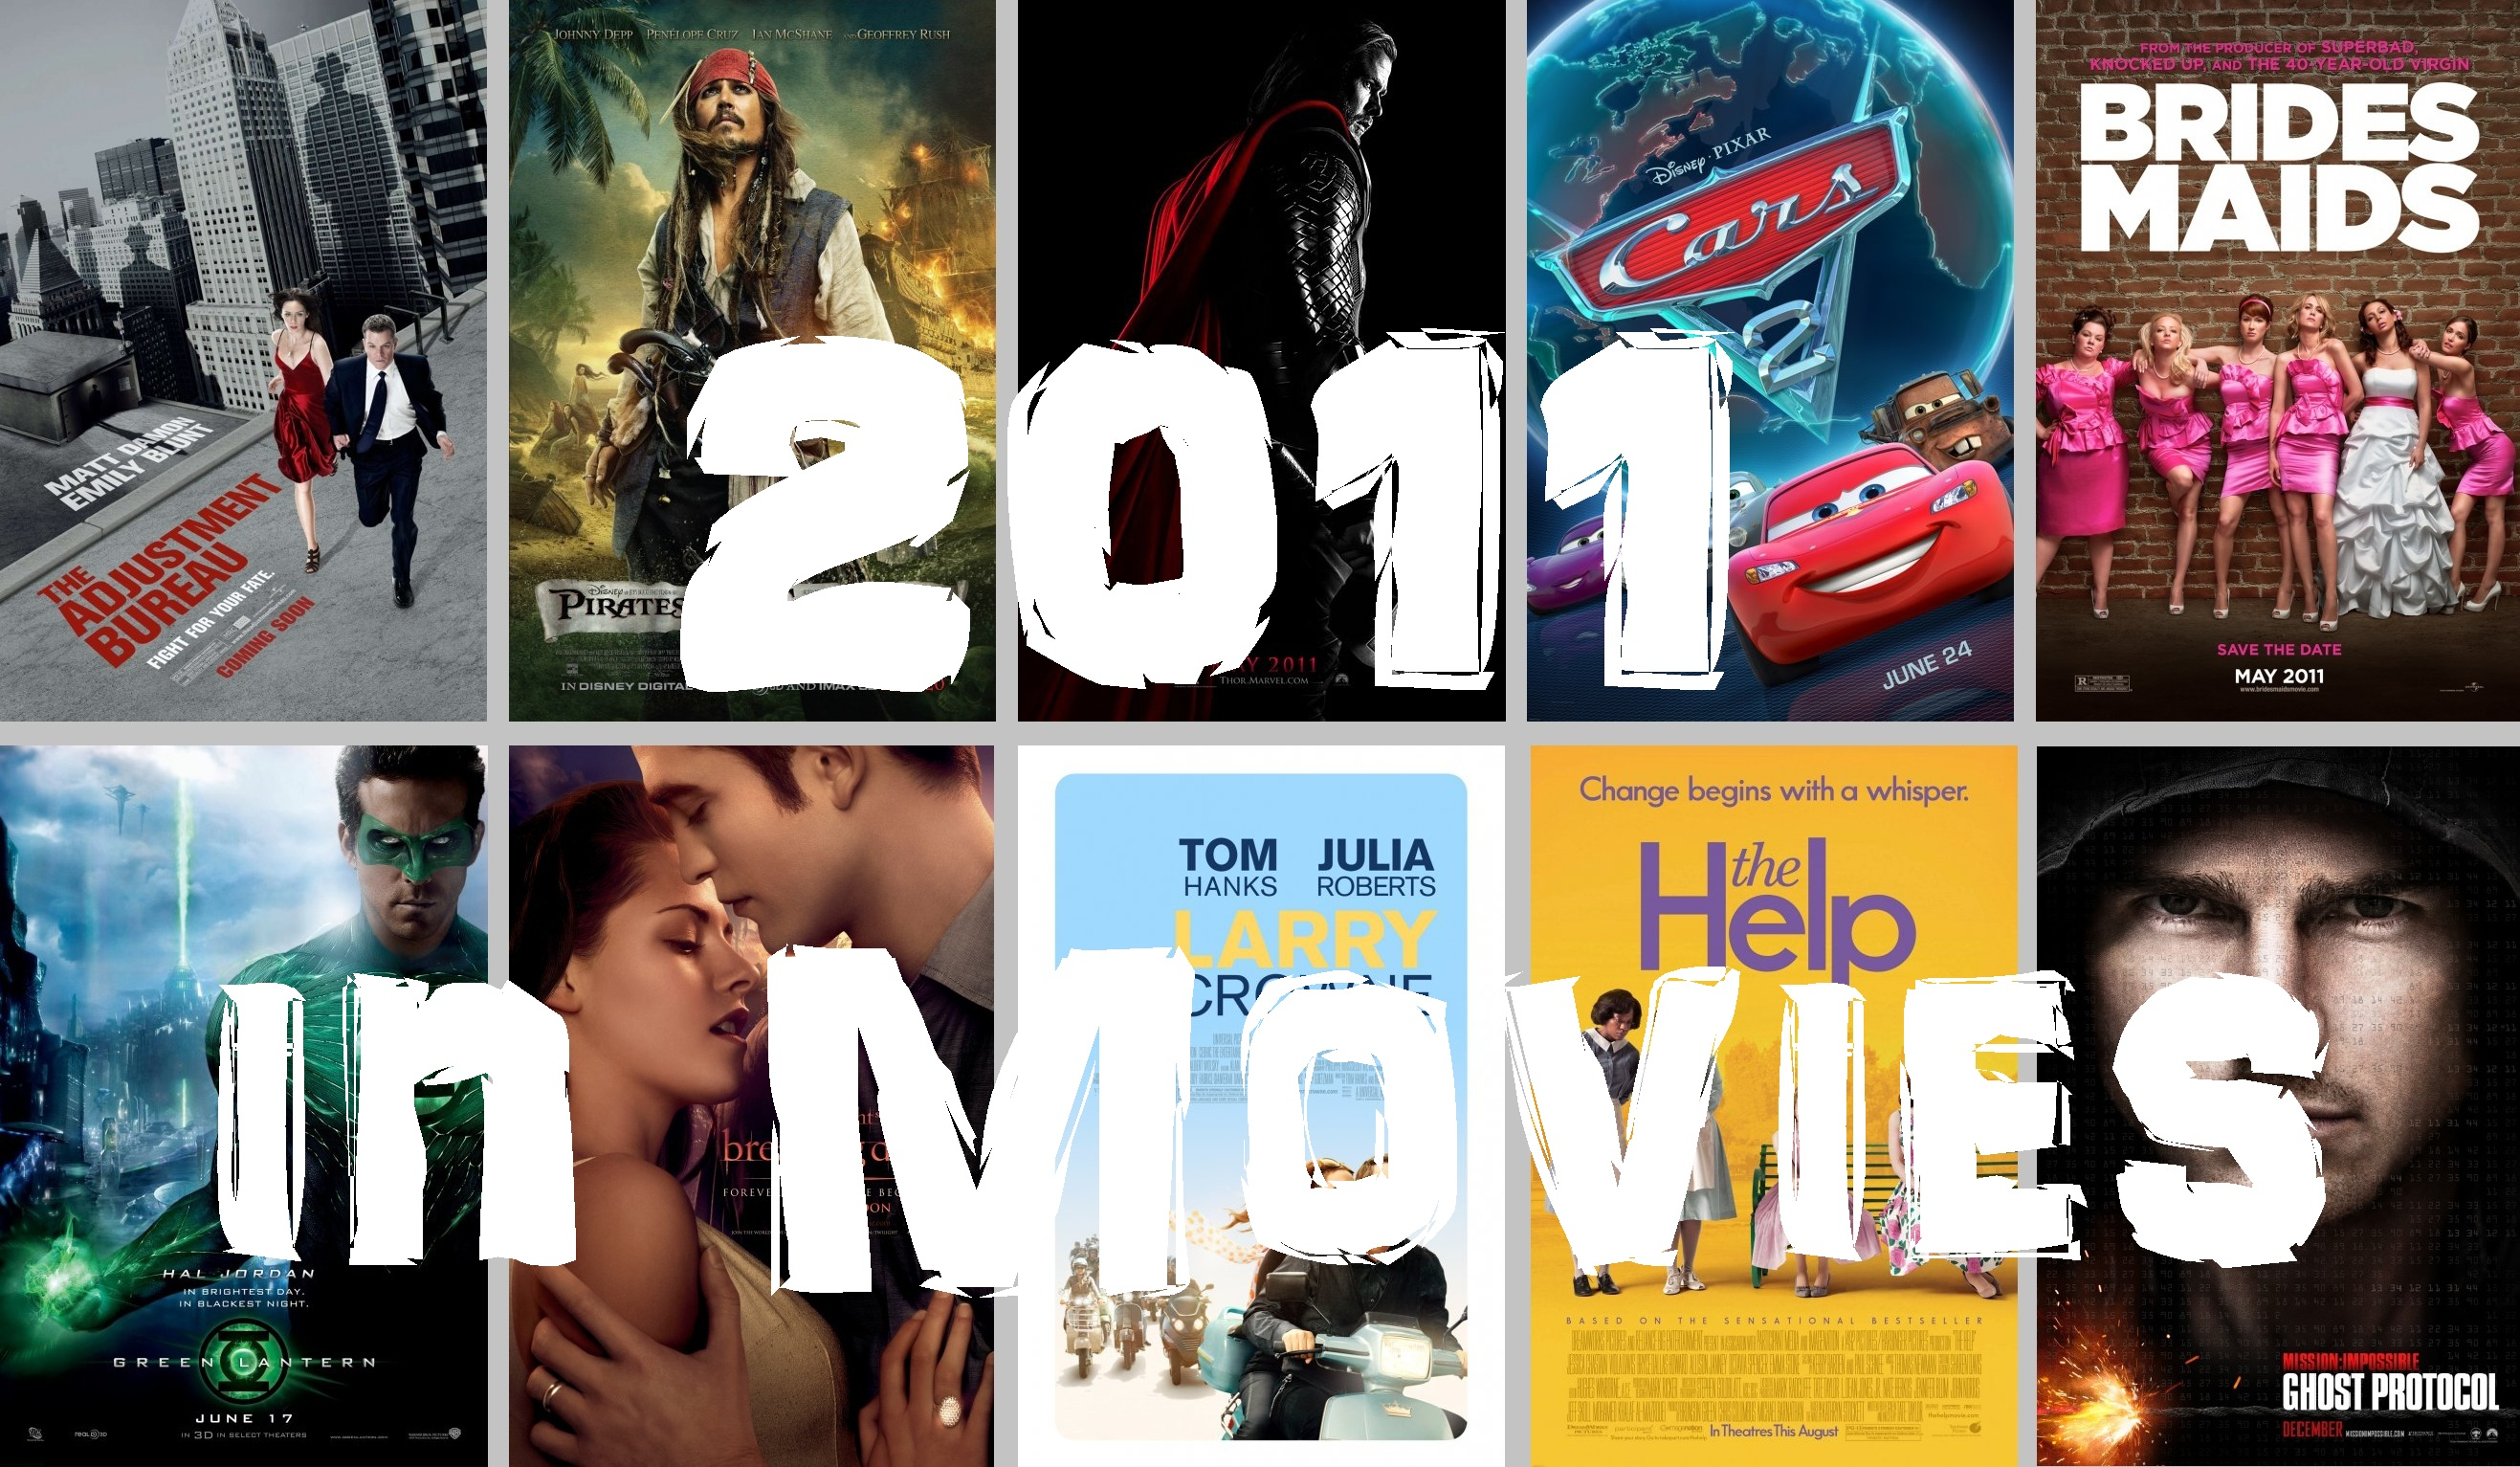 Thescarletsp1der s best amp worst movie picks of 2011 the focused